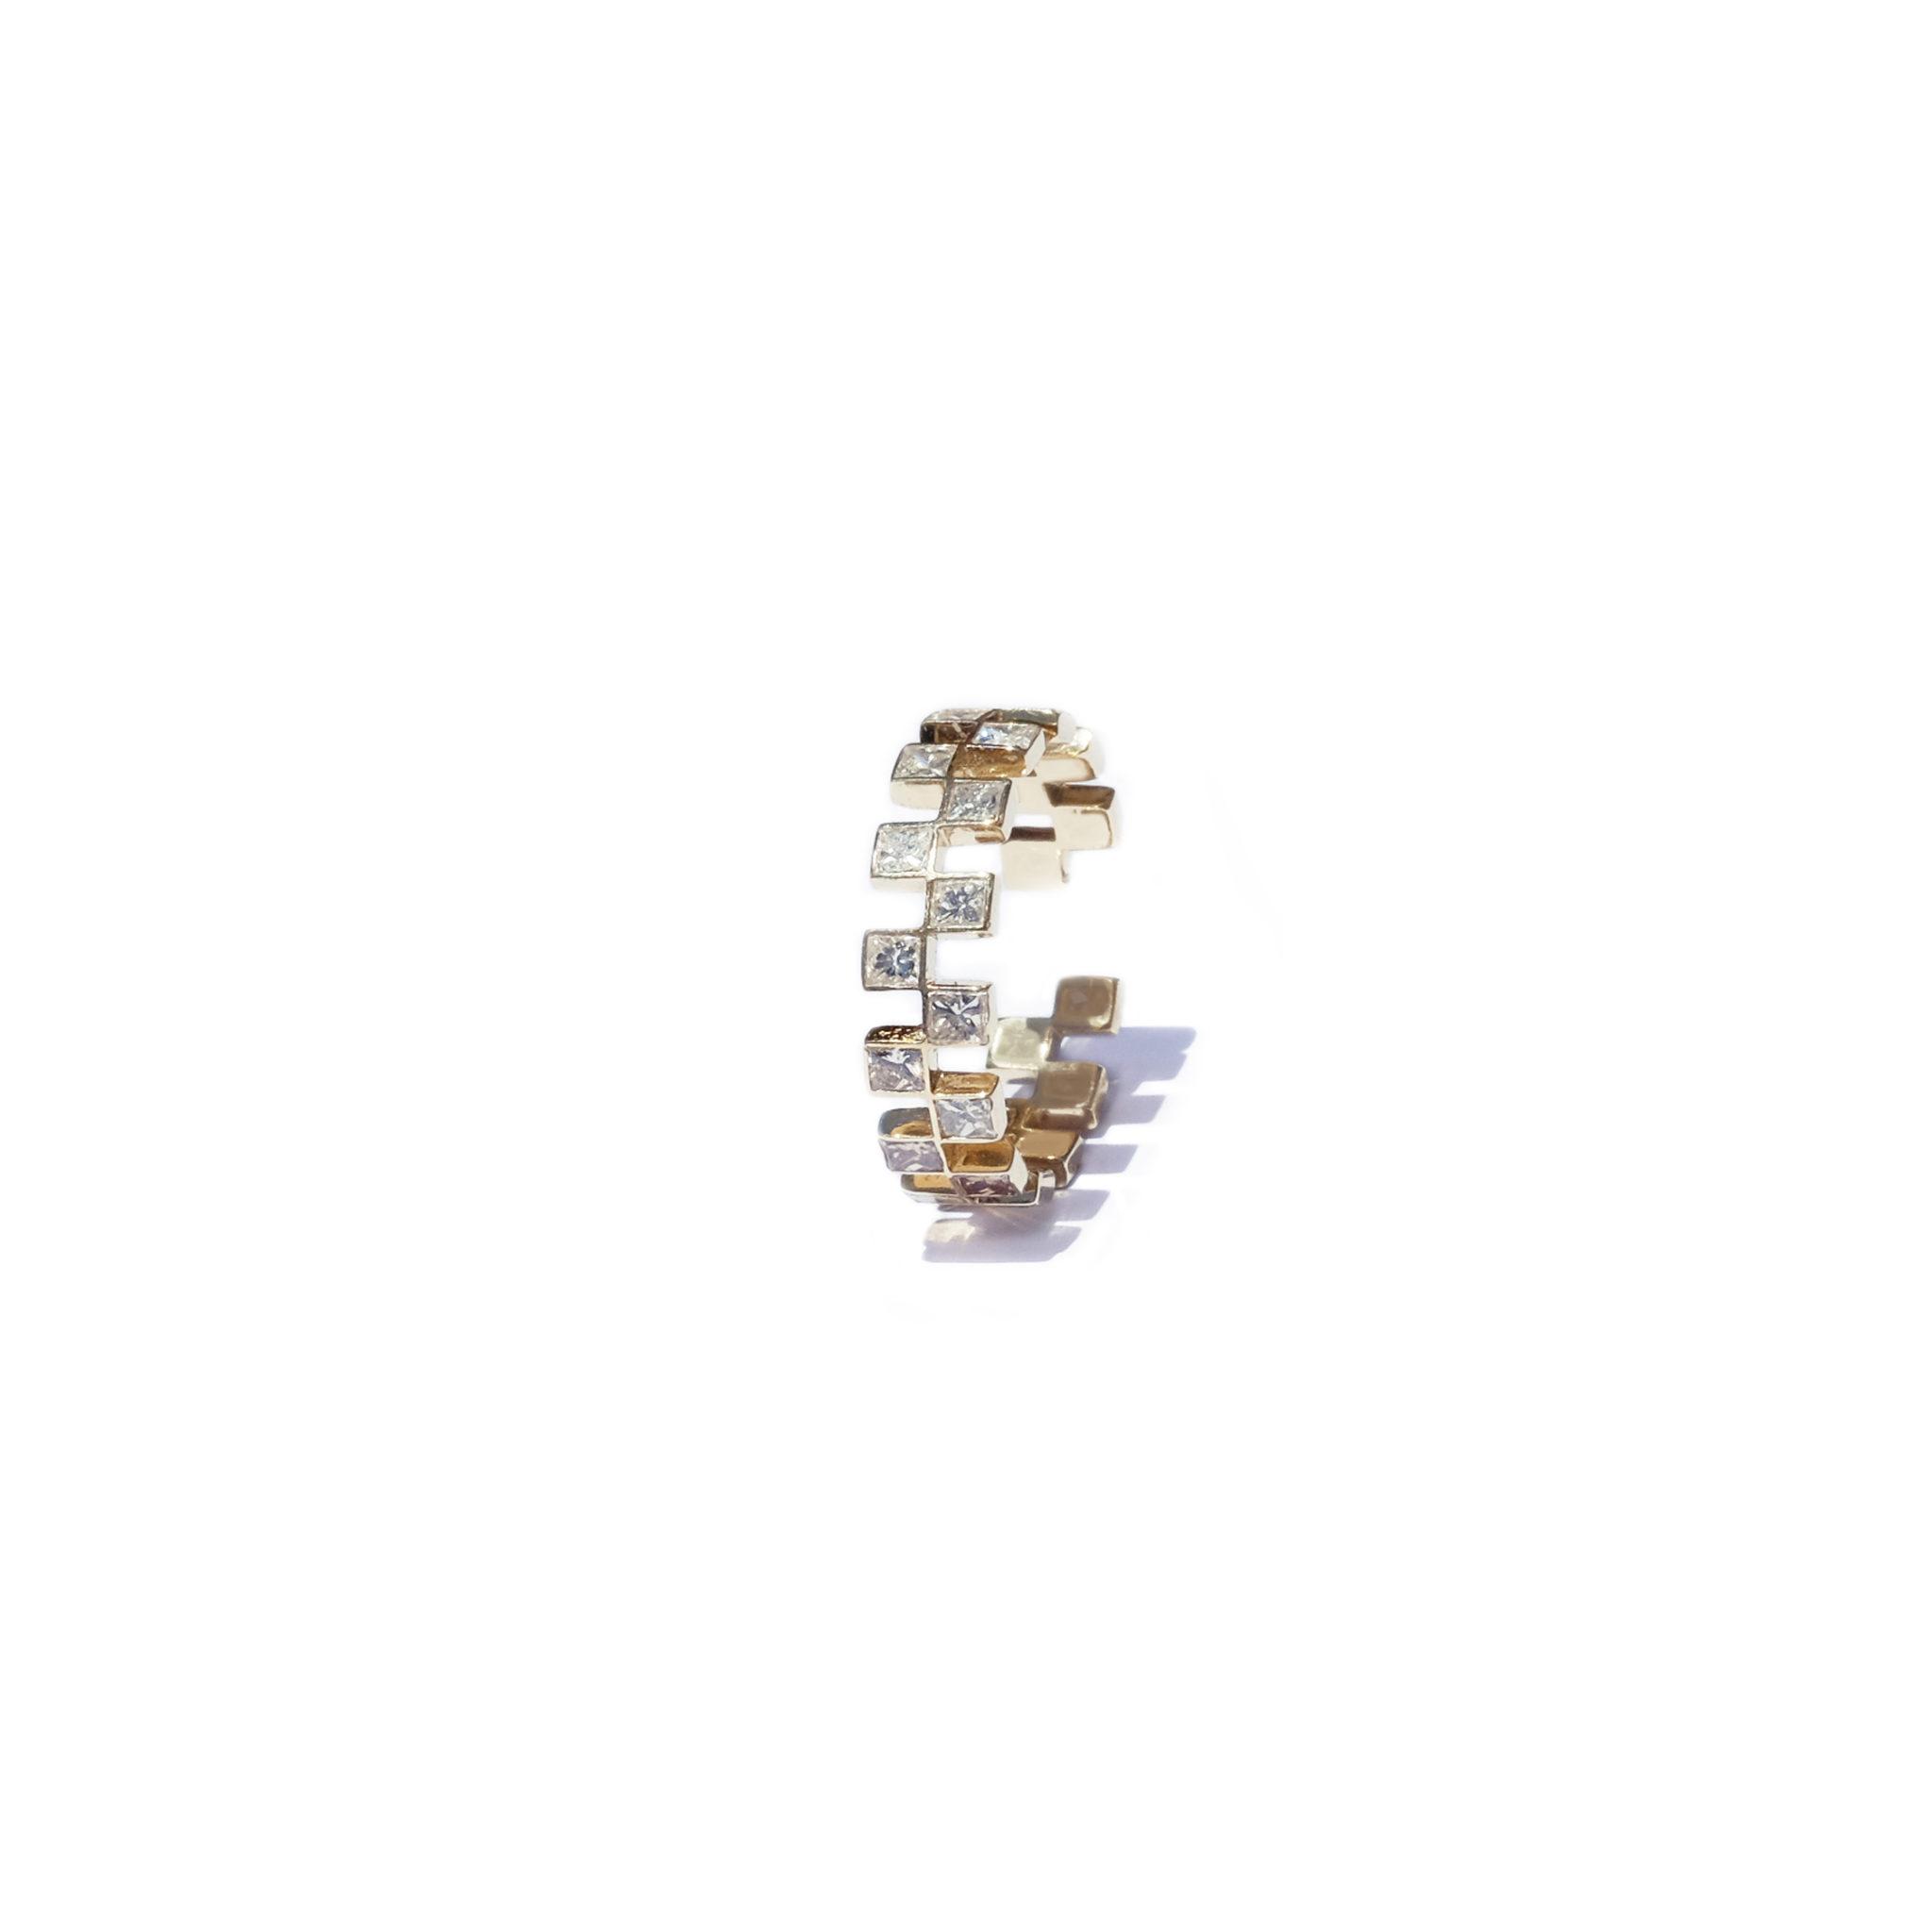 Anerise Ear Cuff_YG-april-diamomd-birthstone-kat-kim